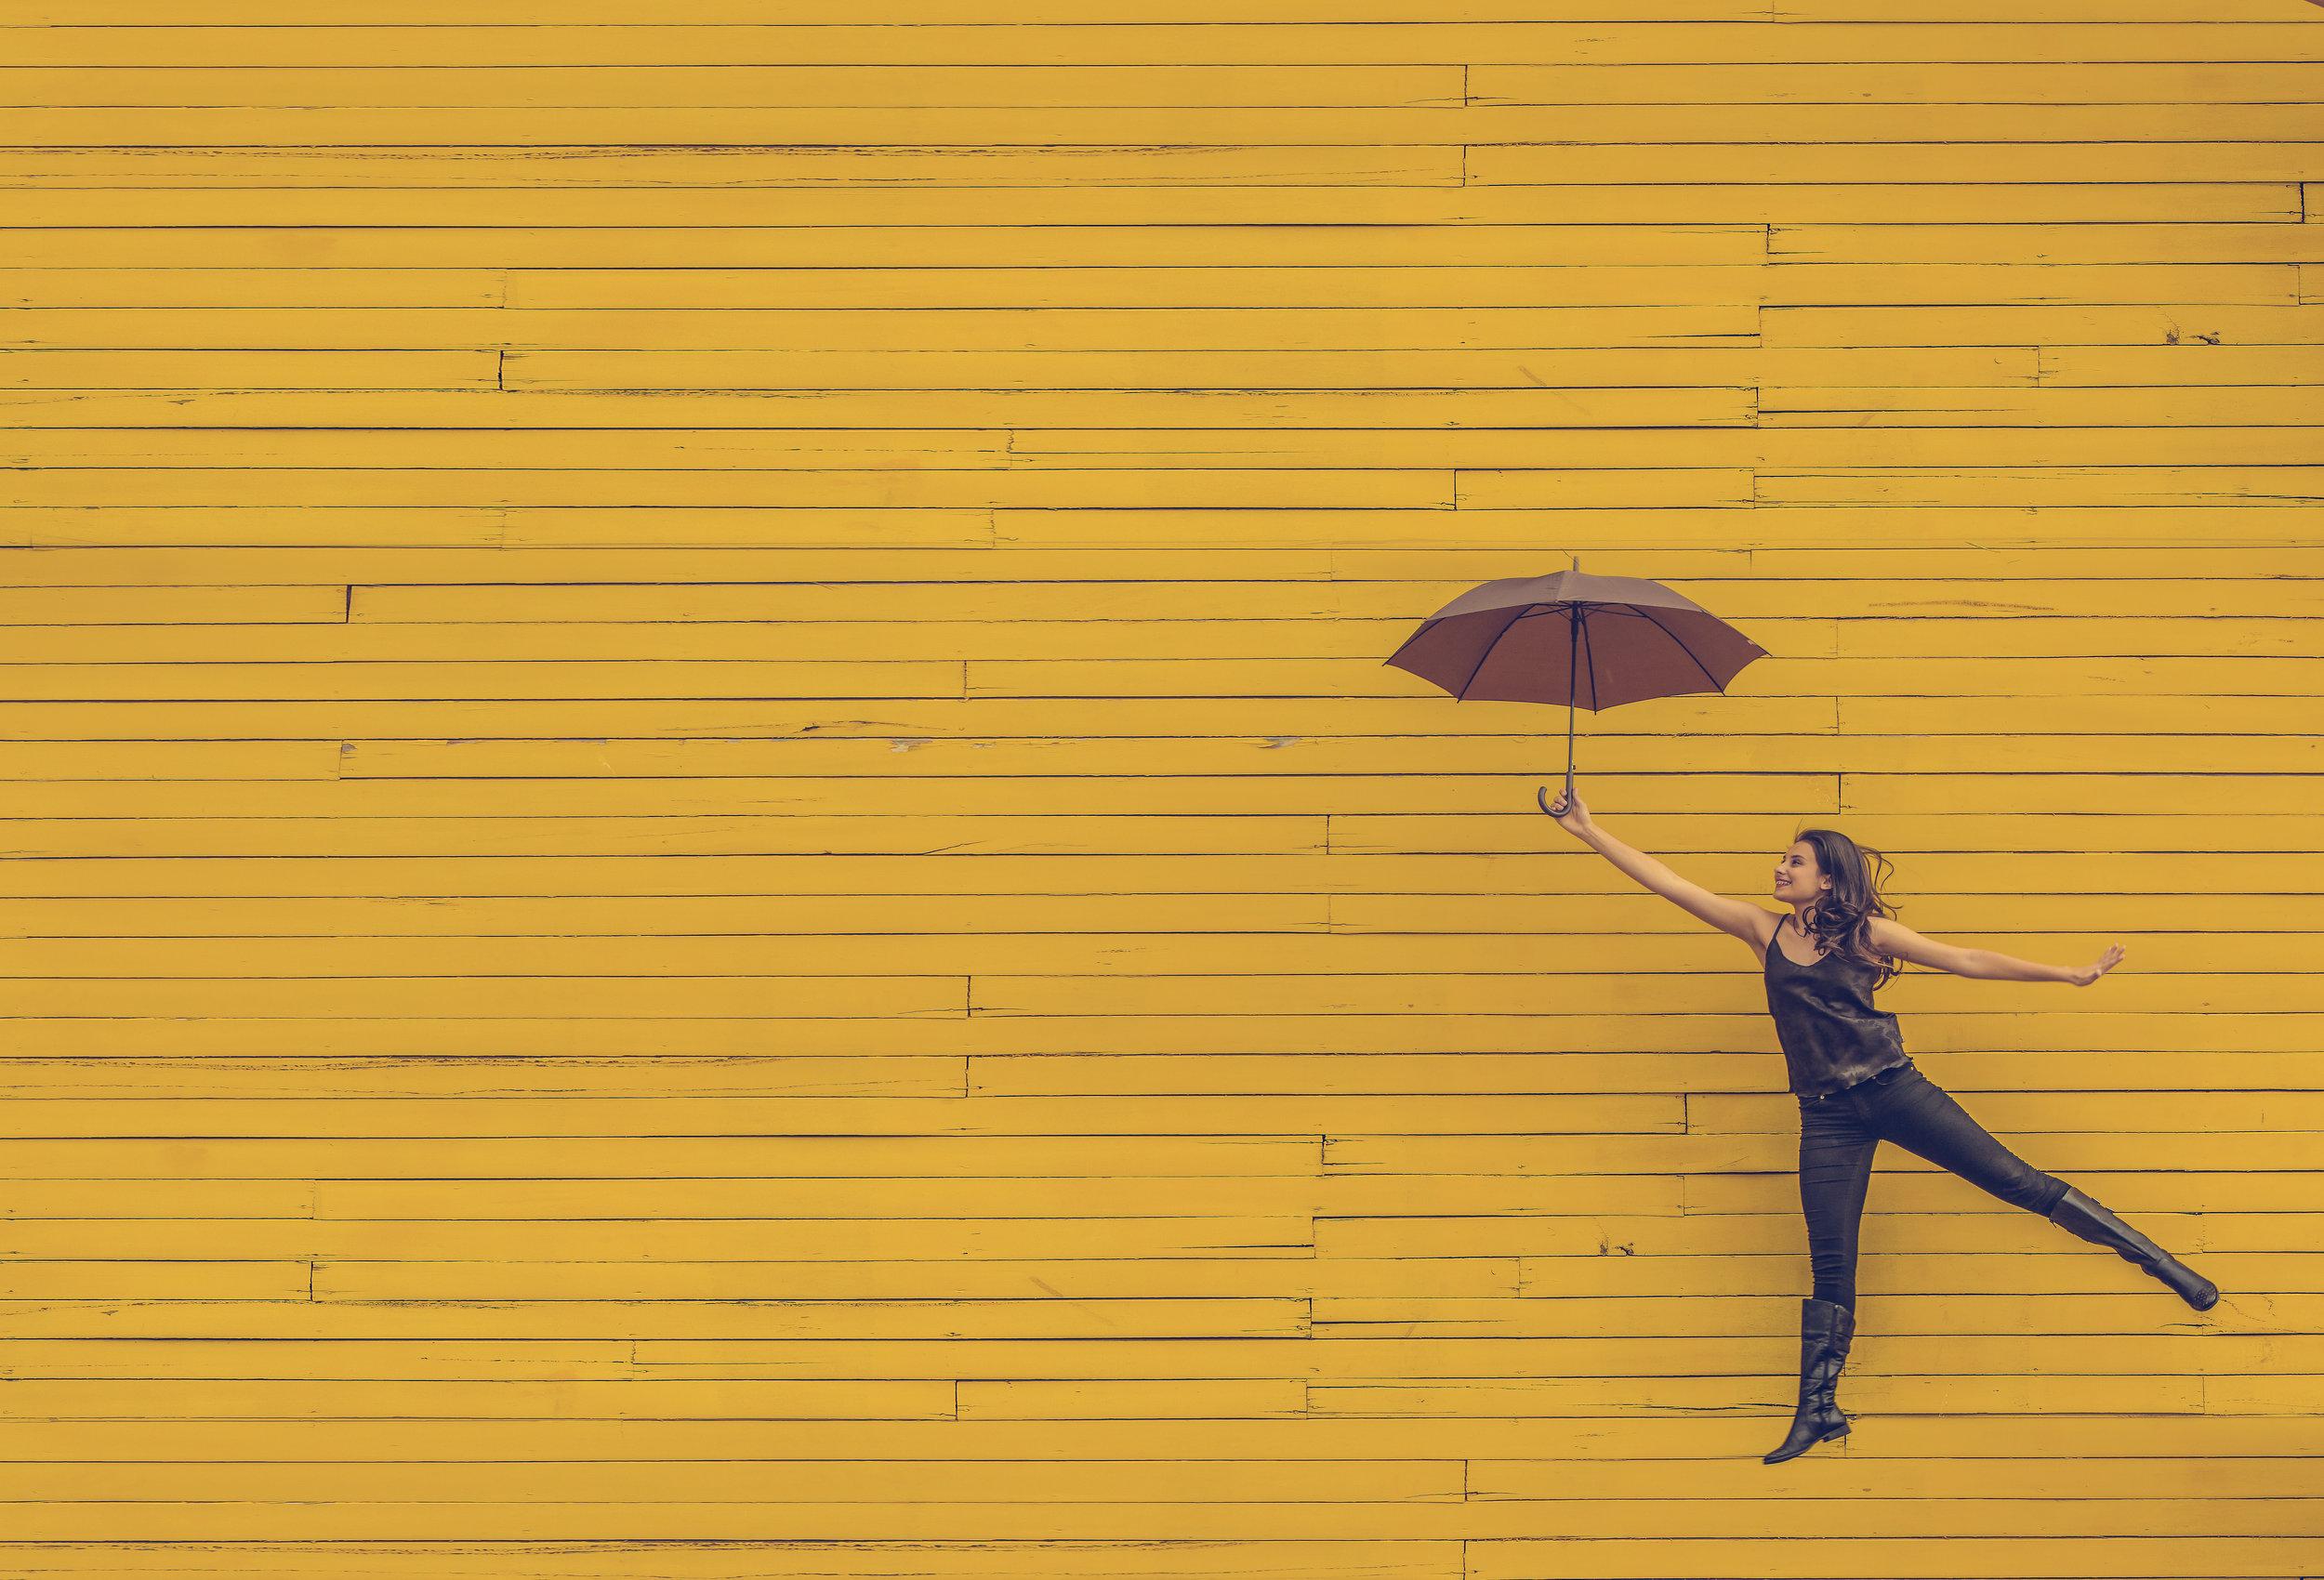 A woman stands holding a brown umbrella. Credit: Edu Lauton/Unsplash